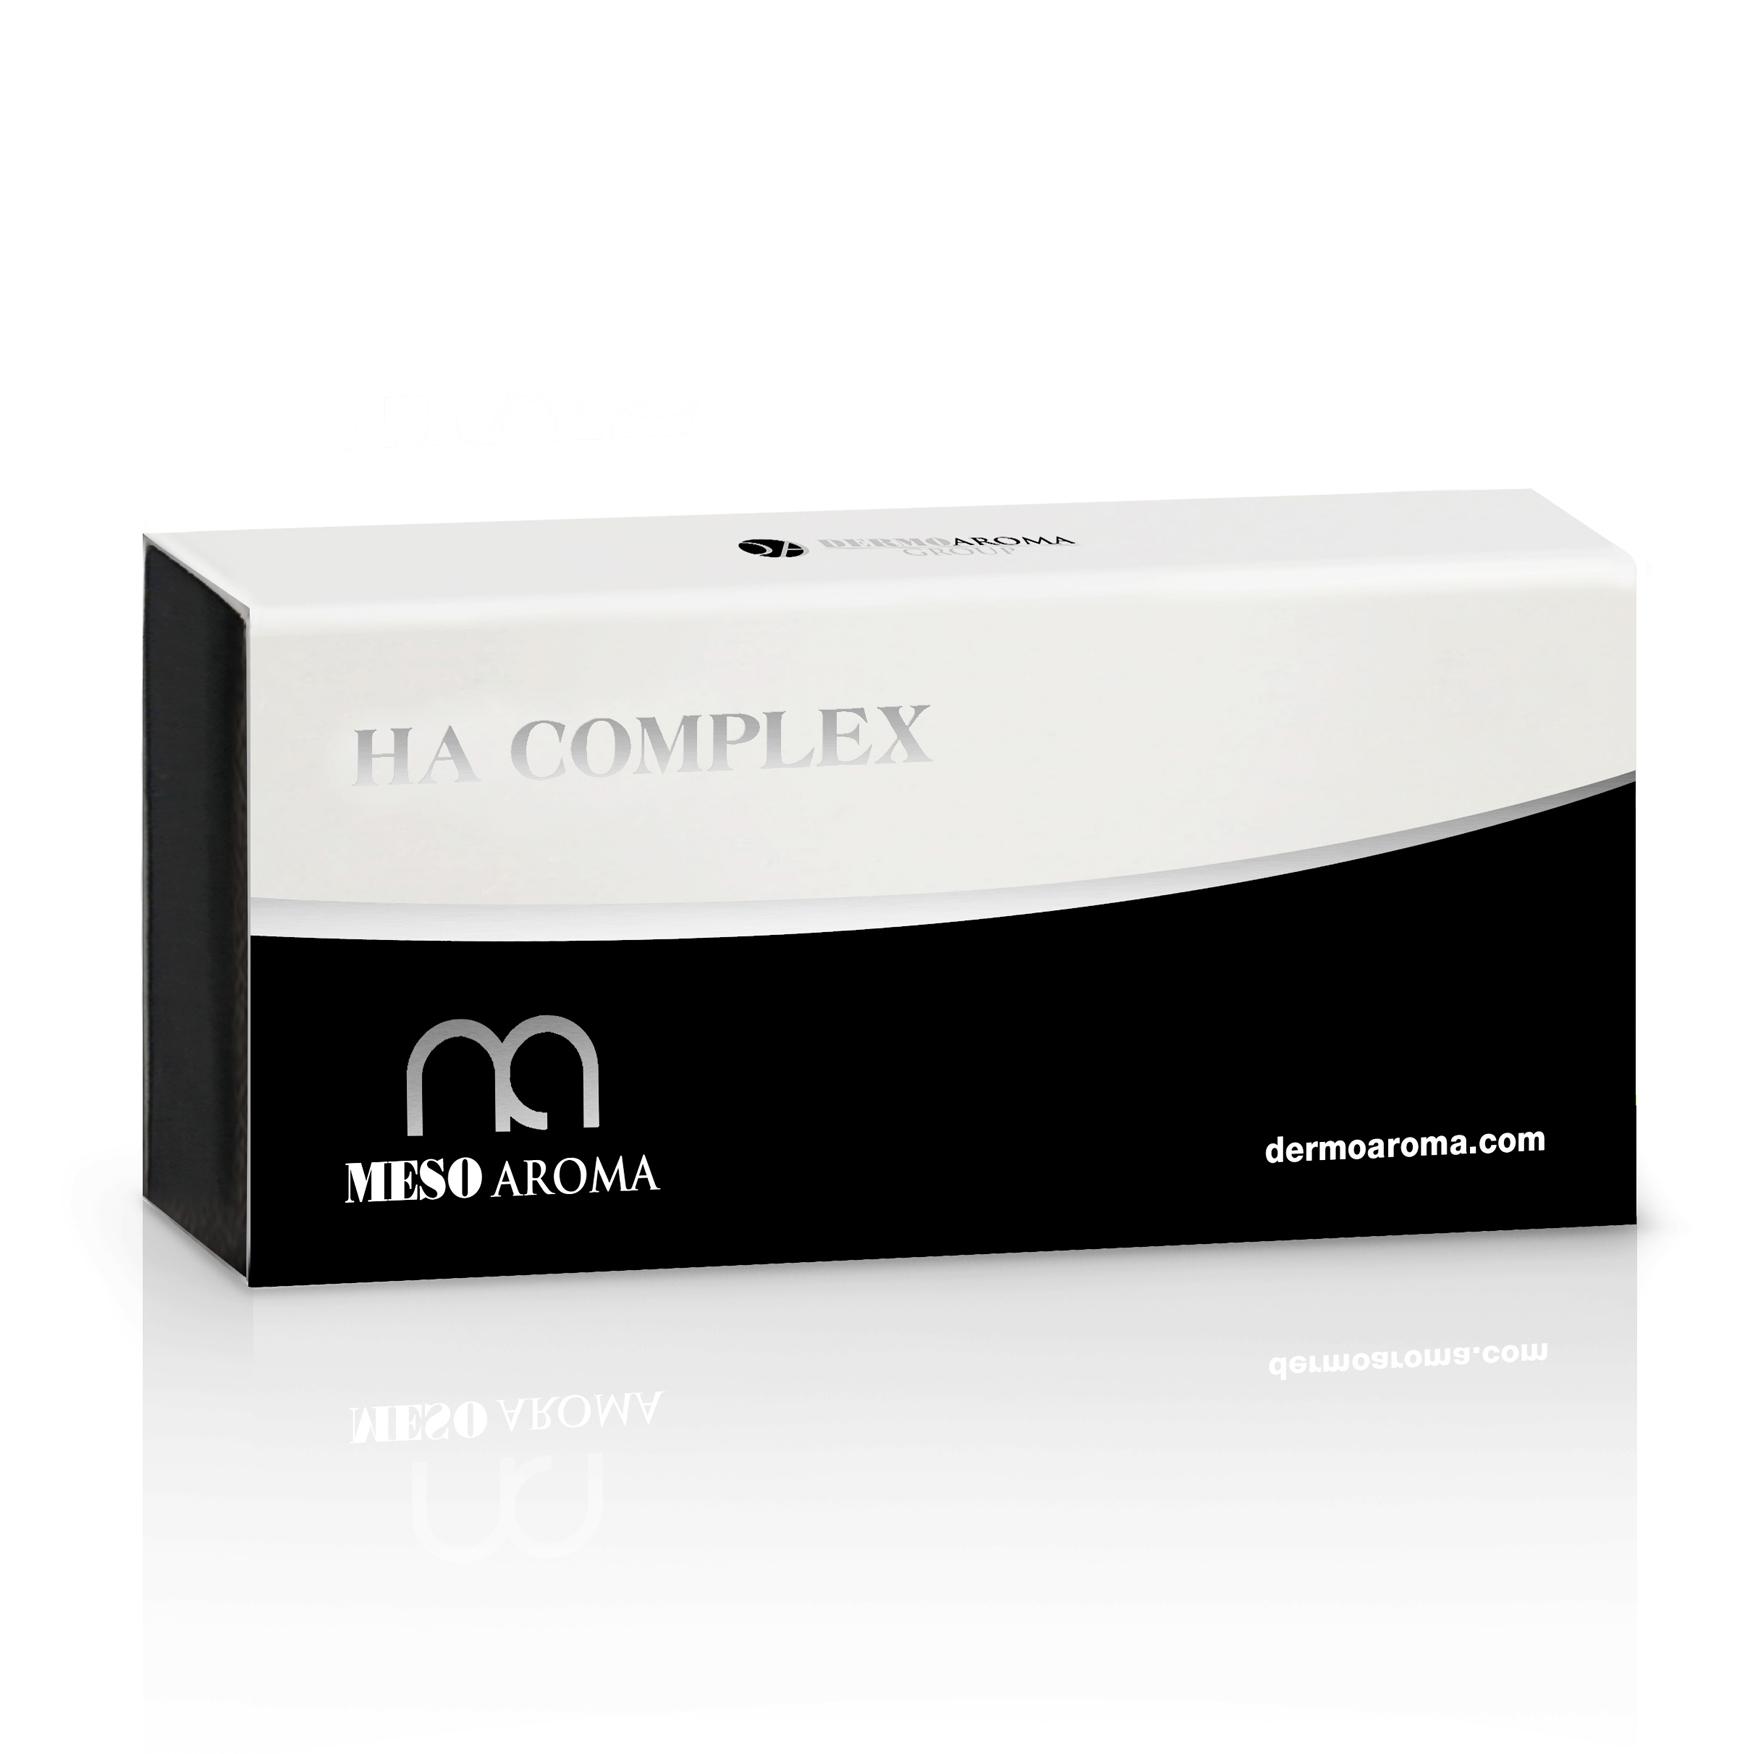 Mesoaroma-ampułki-do-mezoterapii-HA-COMPLEX